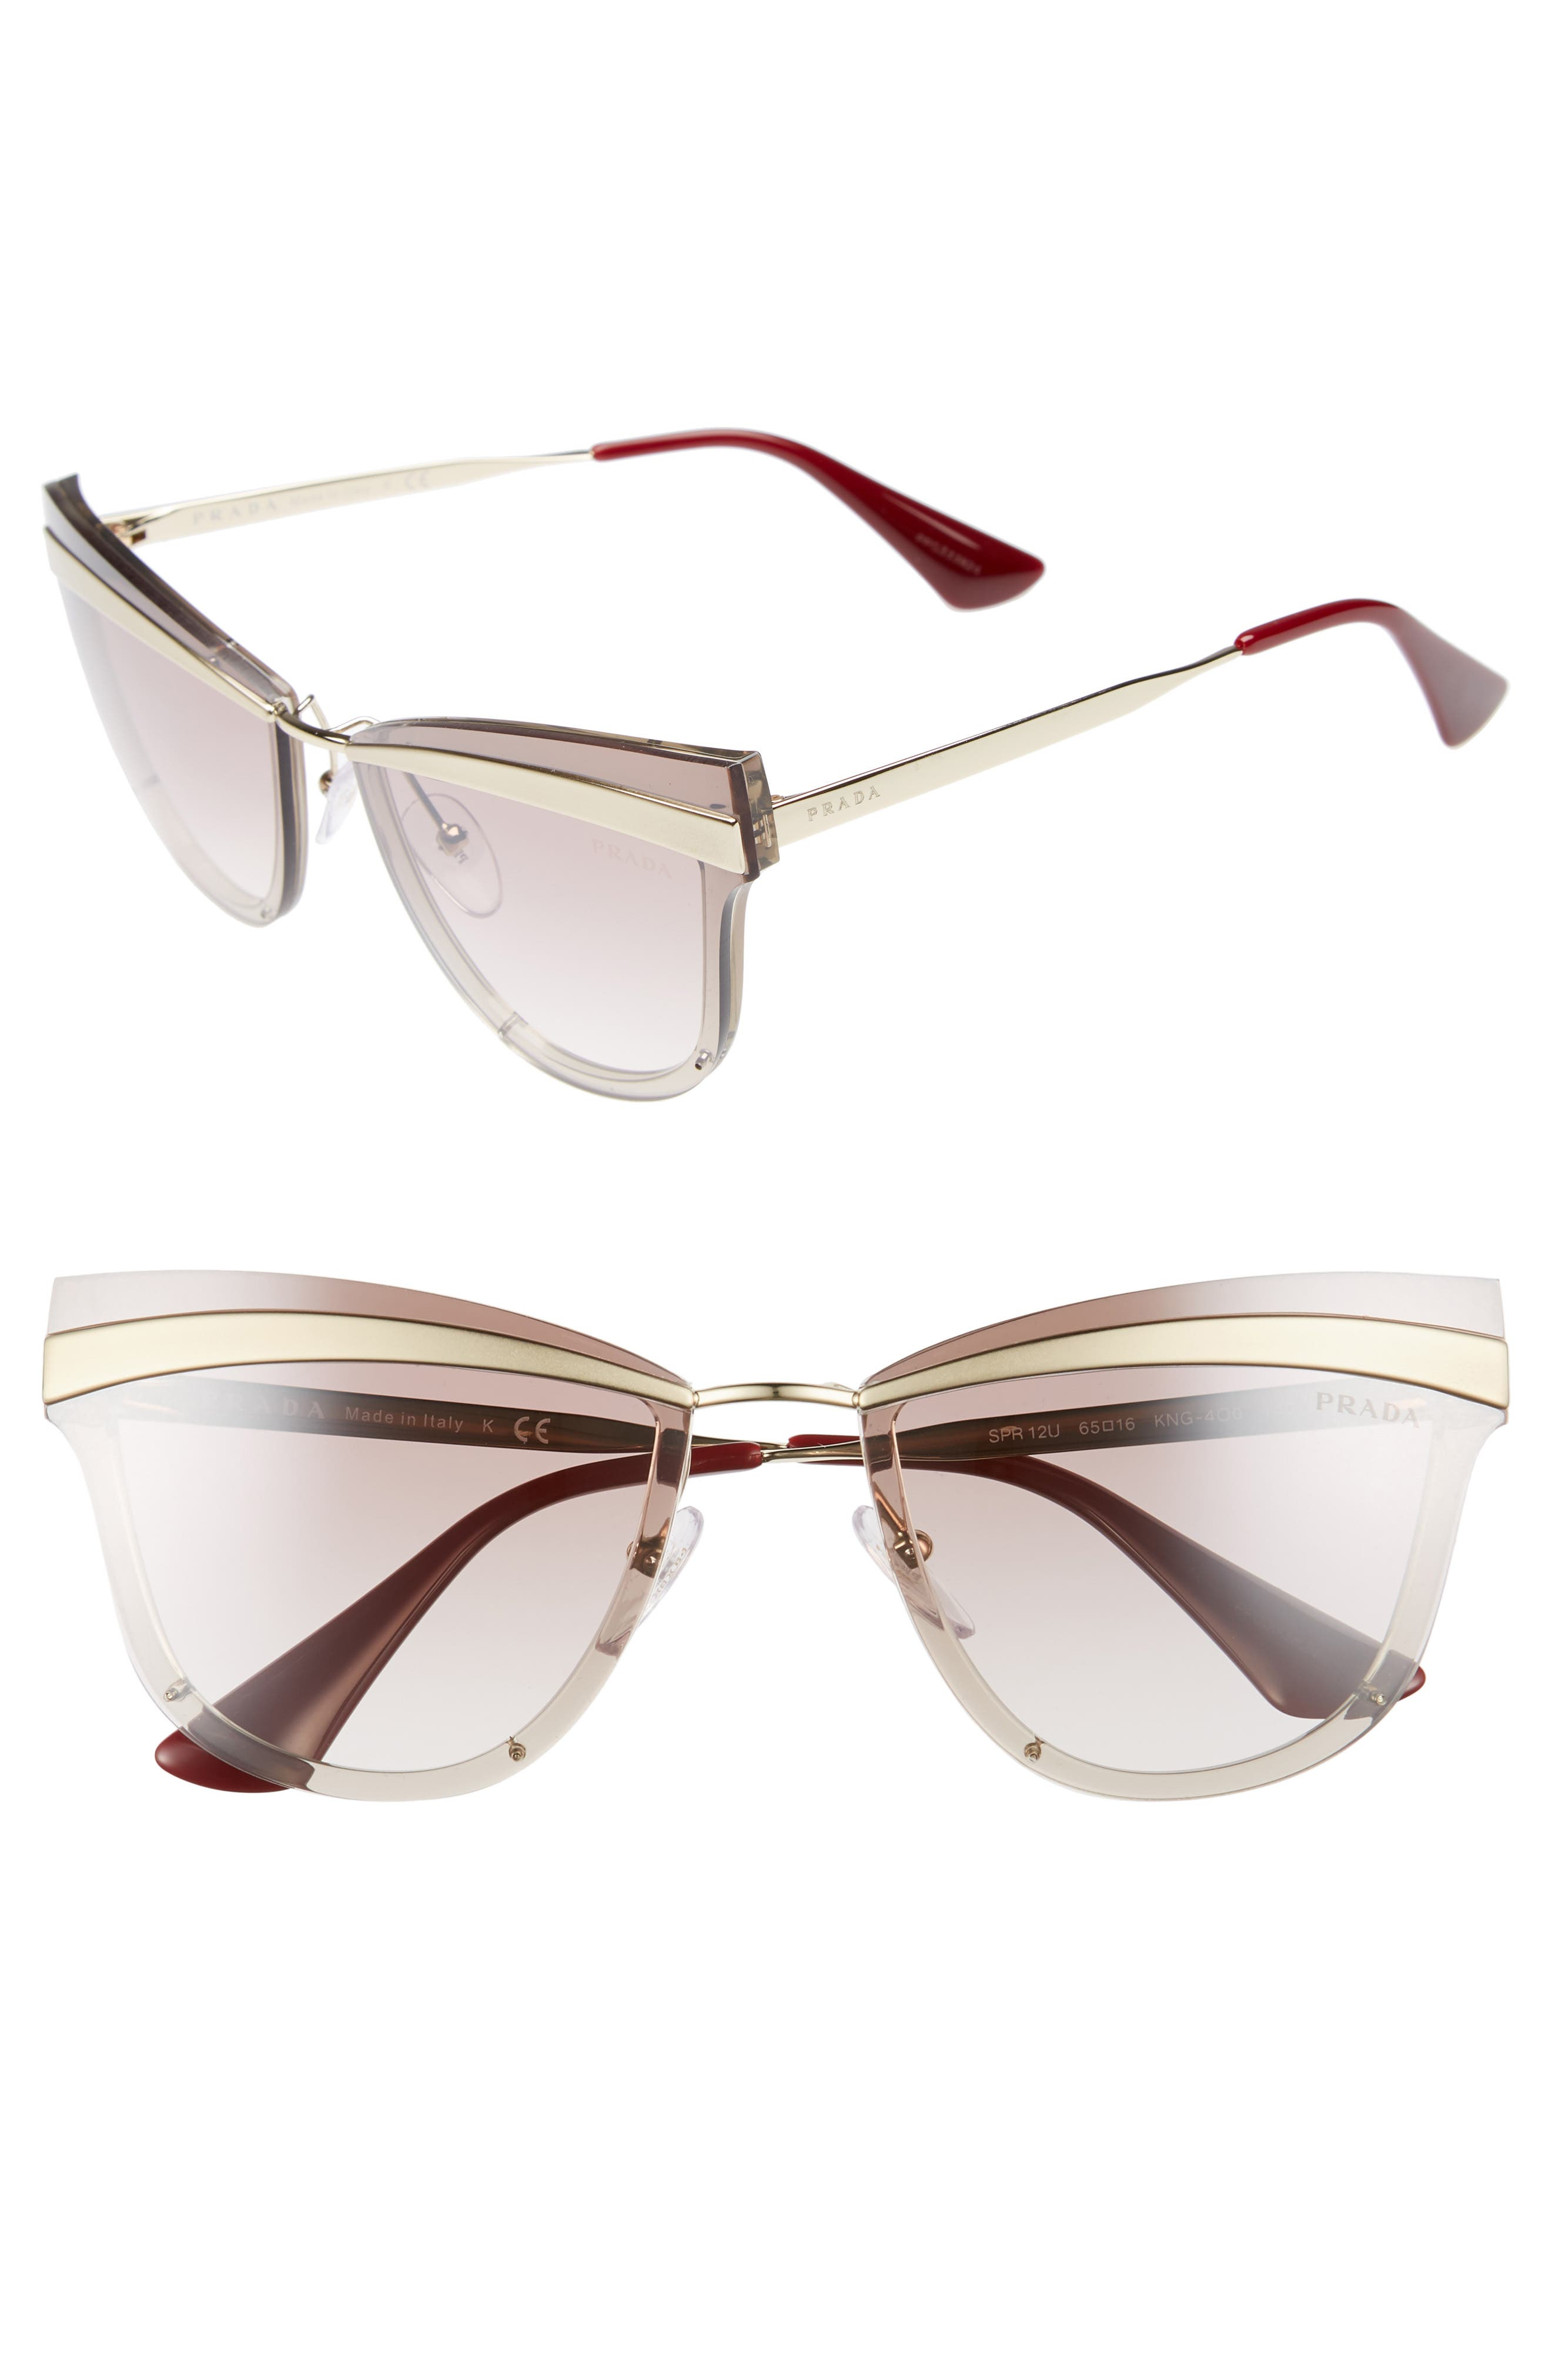 Cinema Evolution 65mm Cat Eye Sunglasses,                         Main,                         color, Beige Gradient Mirror